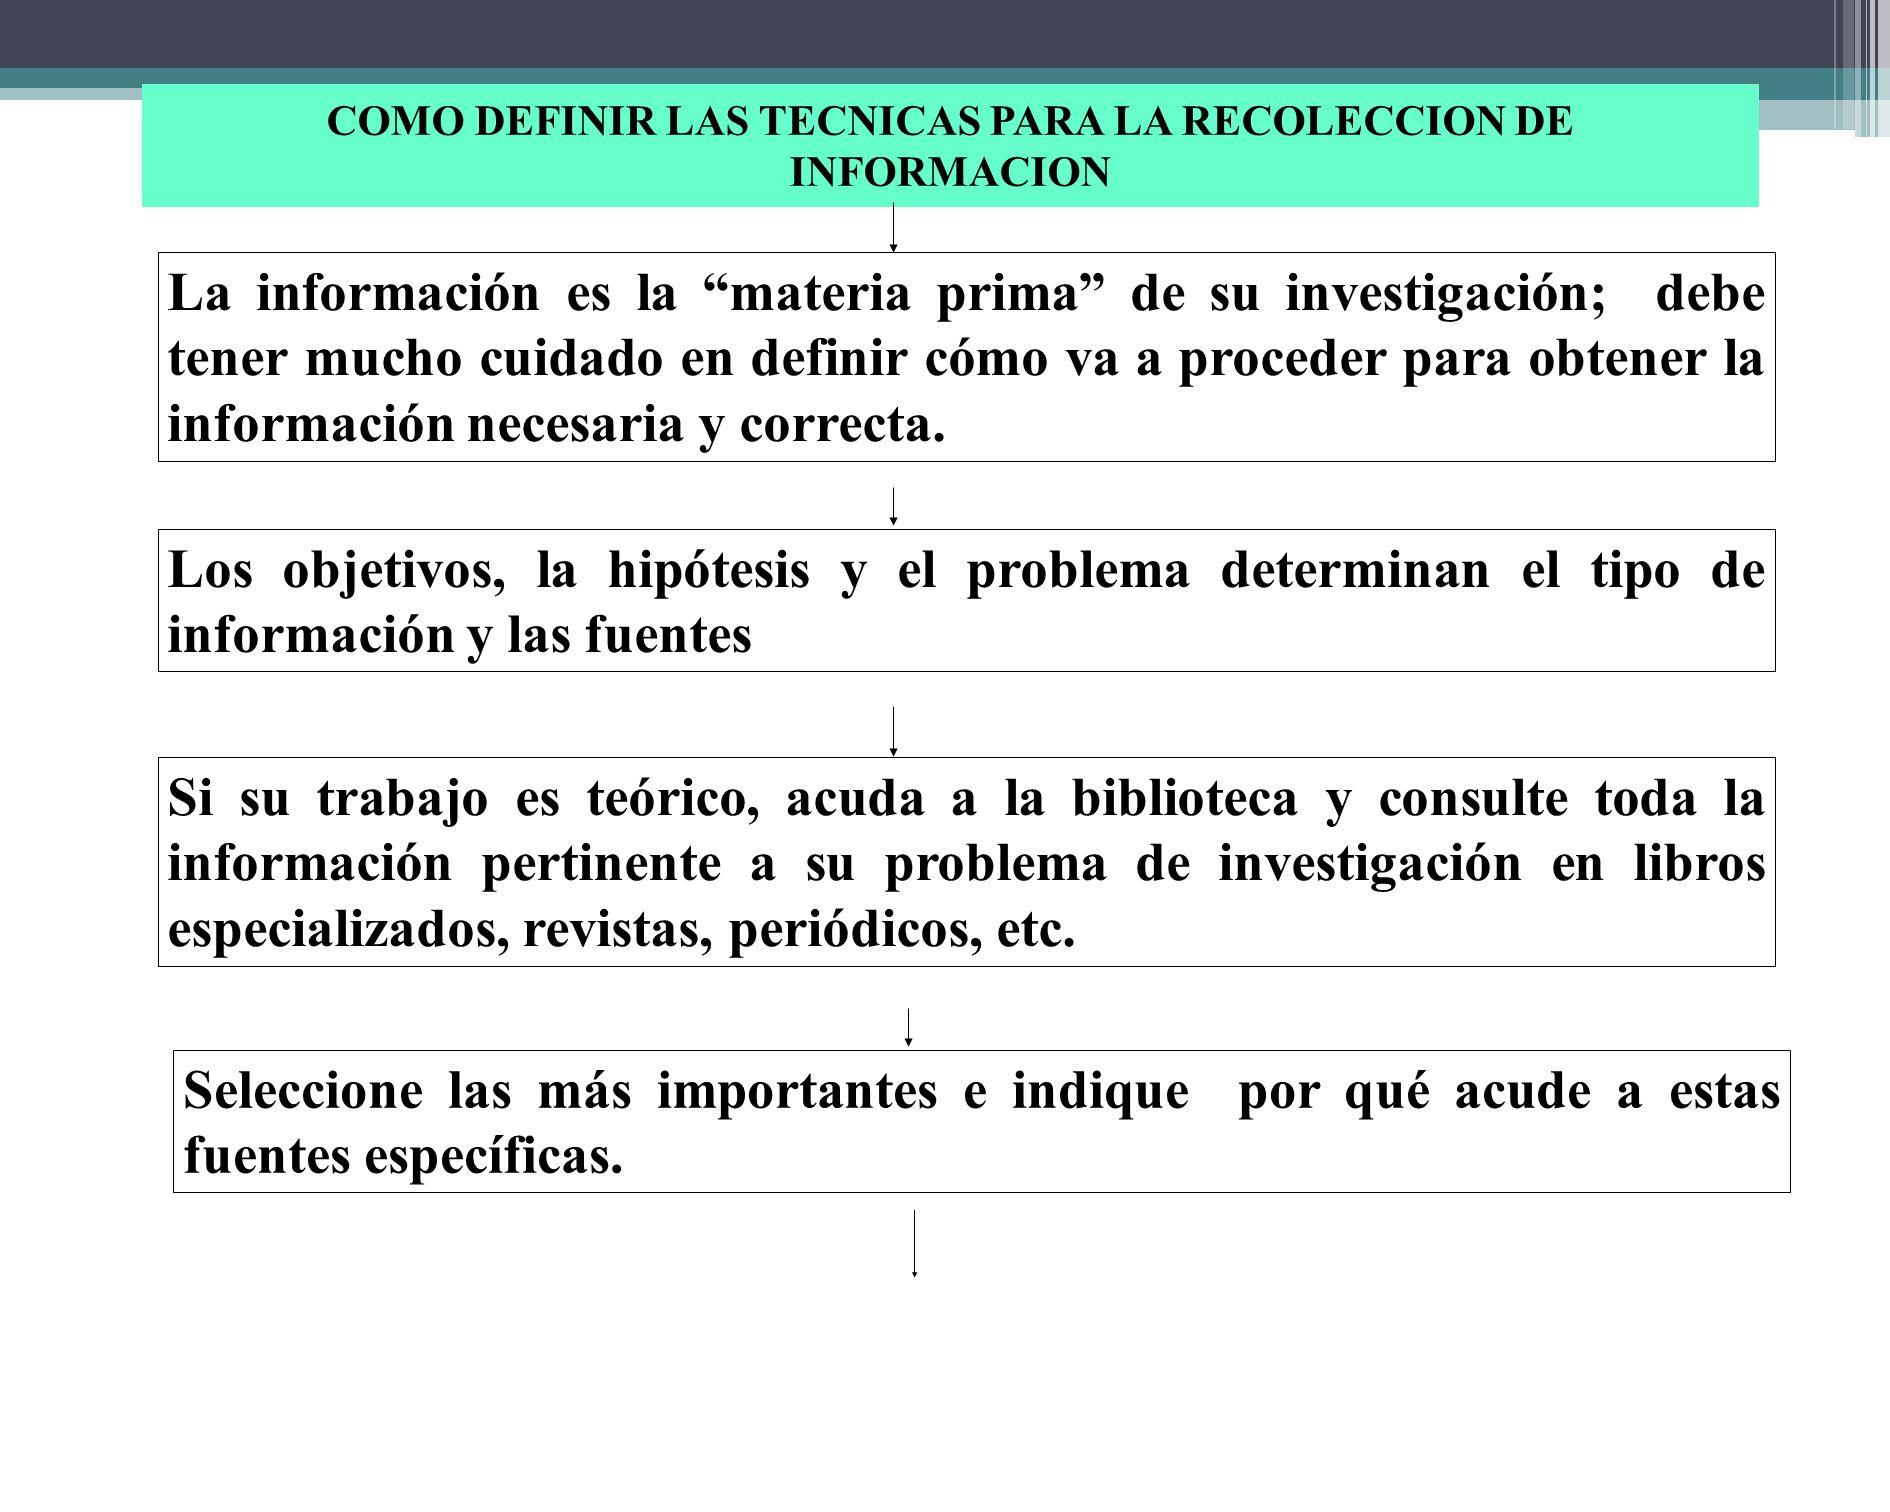 Información oral o escrita que es recopilada directamente a través de relatos o escritos transmitidos por los participantes en un suceso o acontecimie